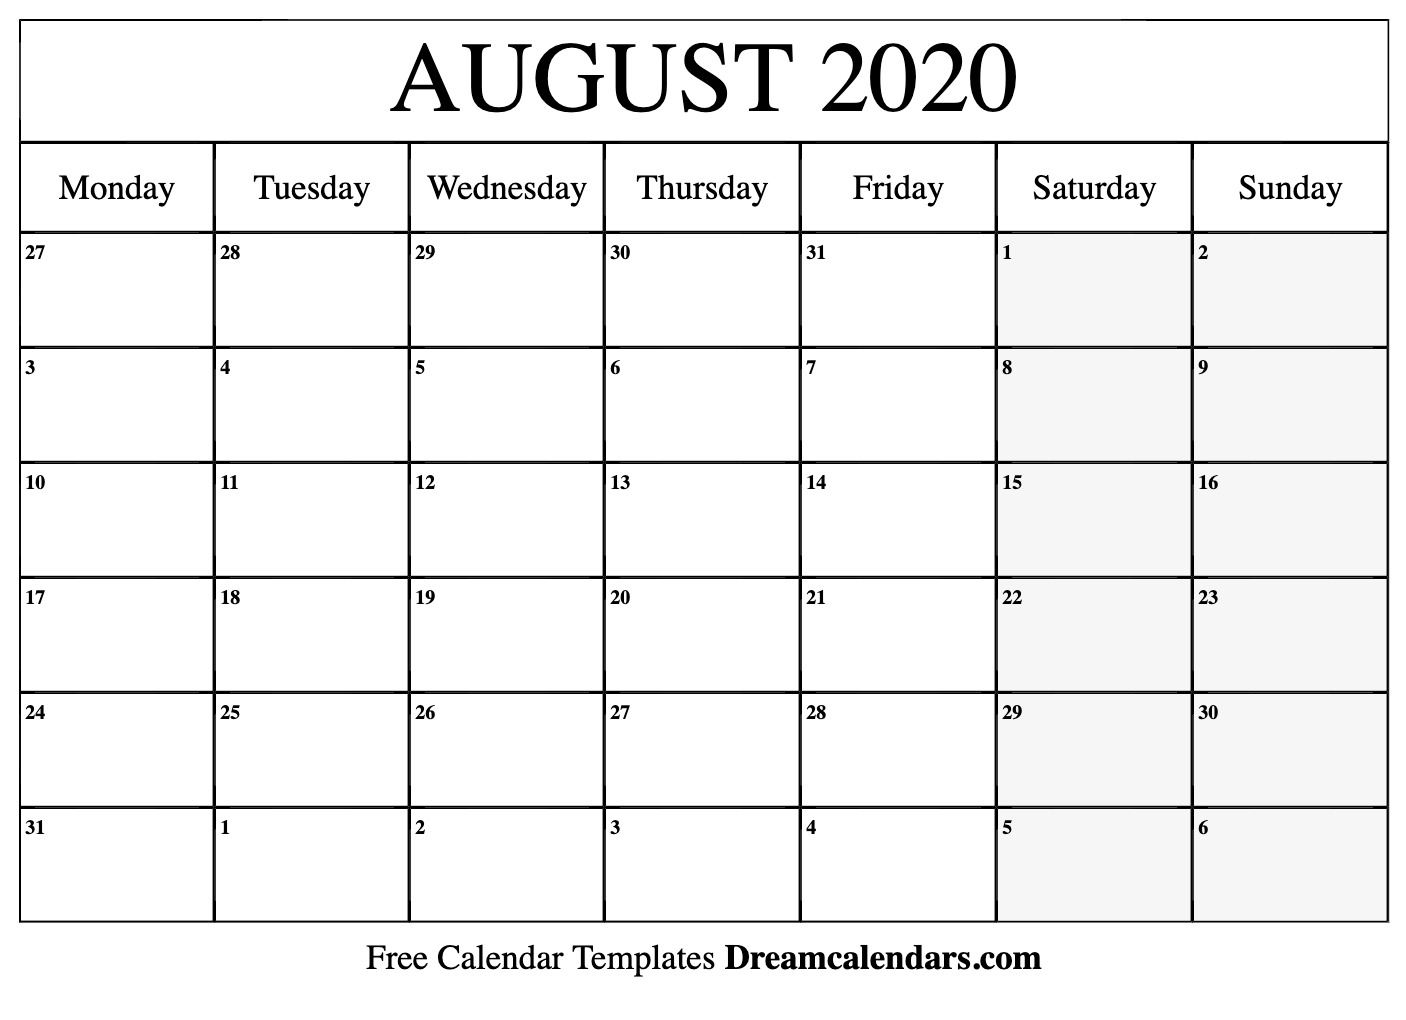 Free Blank August 2020 Printable Calendar in December 2020 Calendar Beta Calendars